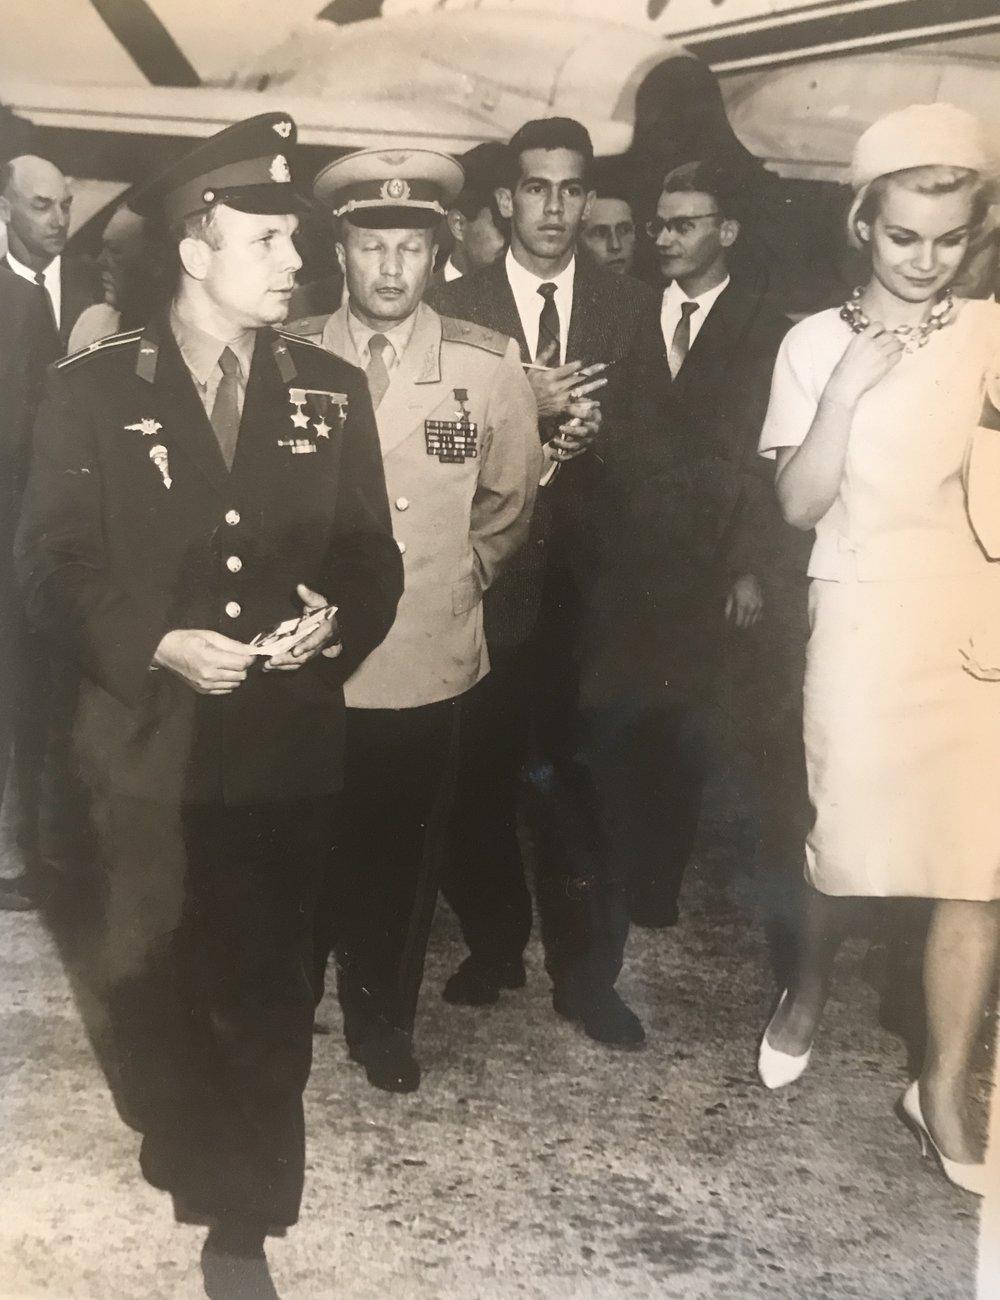 First man in space Yuri Gagarin with my mother Elena Dixon